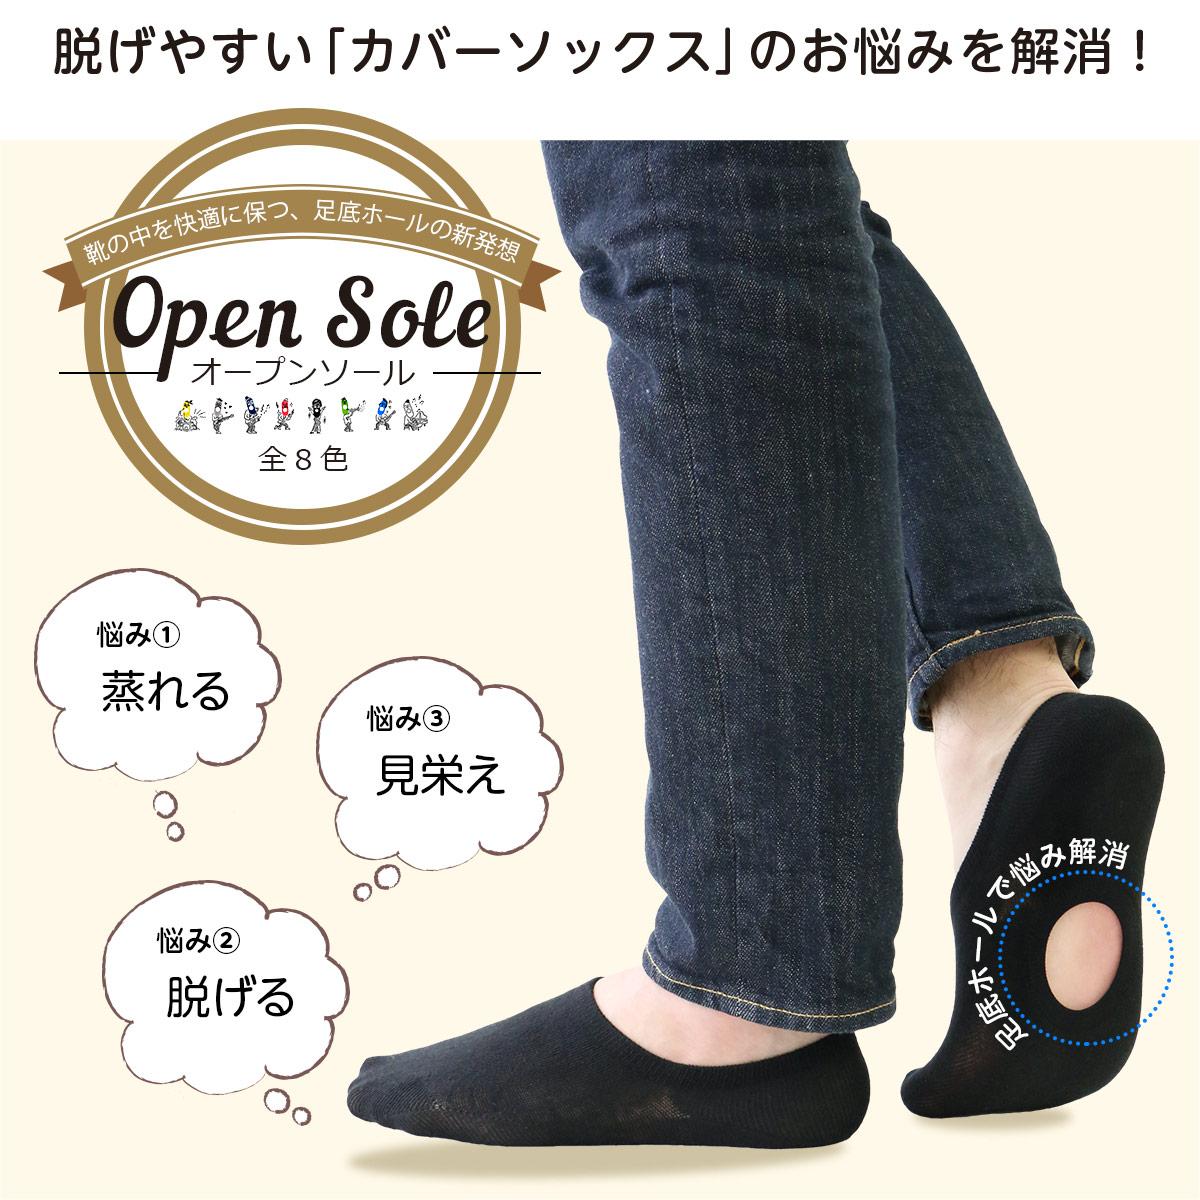 OPEN SOLE オープンソール メンズ カバーソックス こだわりの靴下 フットカバー 足底ホール特許設計 抗菌防臭 02670001 【ゆうパケット・6点まで】